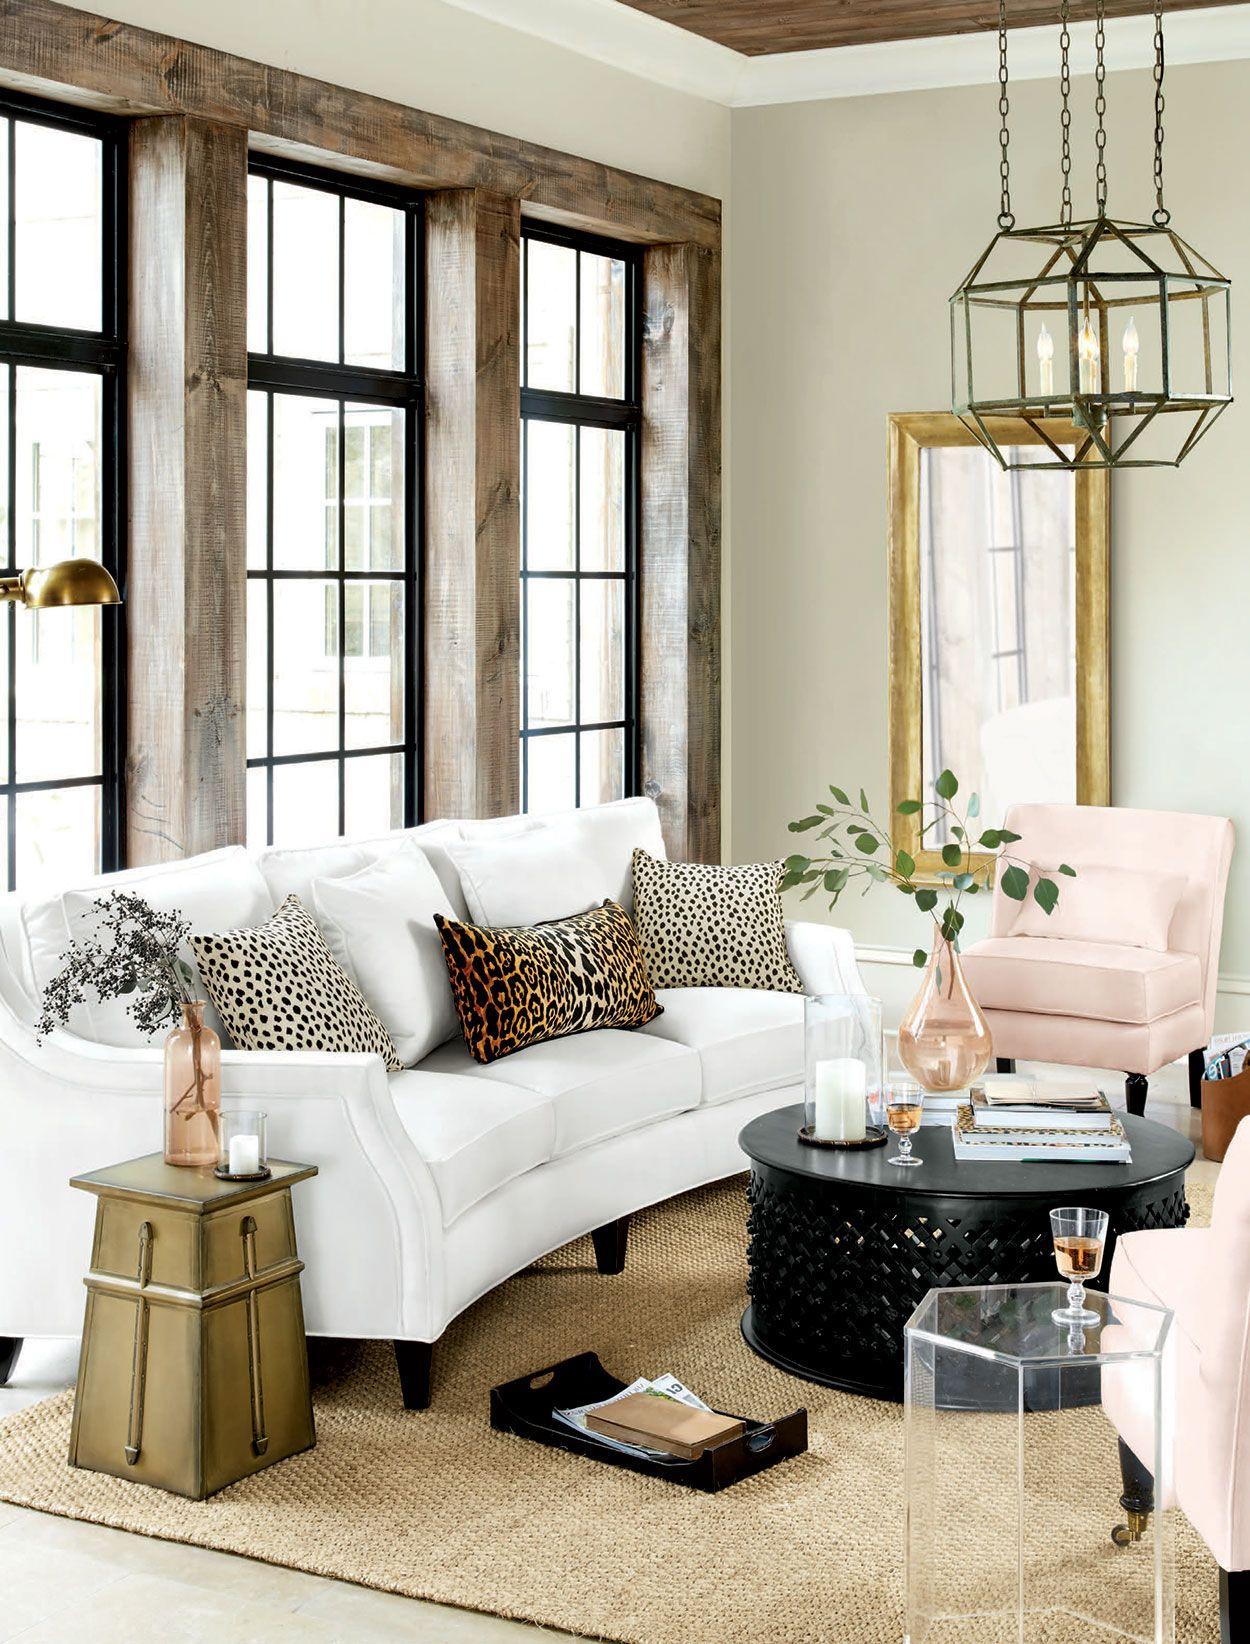 Interior home decorating ideas living room living rooms  living rooms throw pillows and pillows